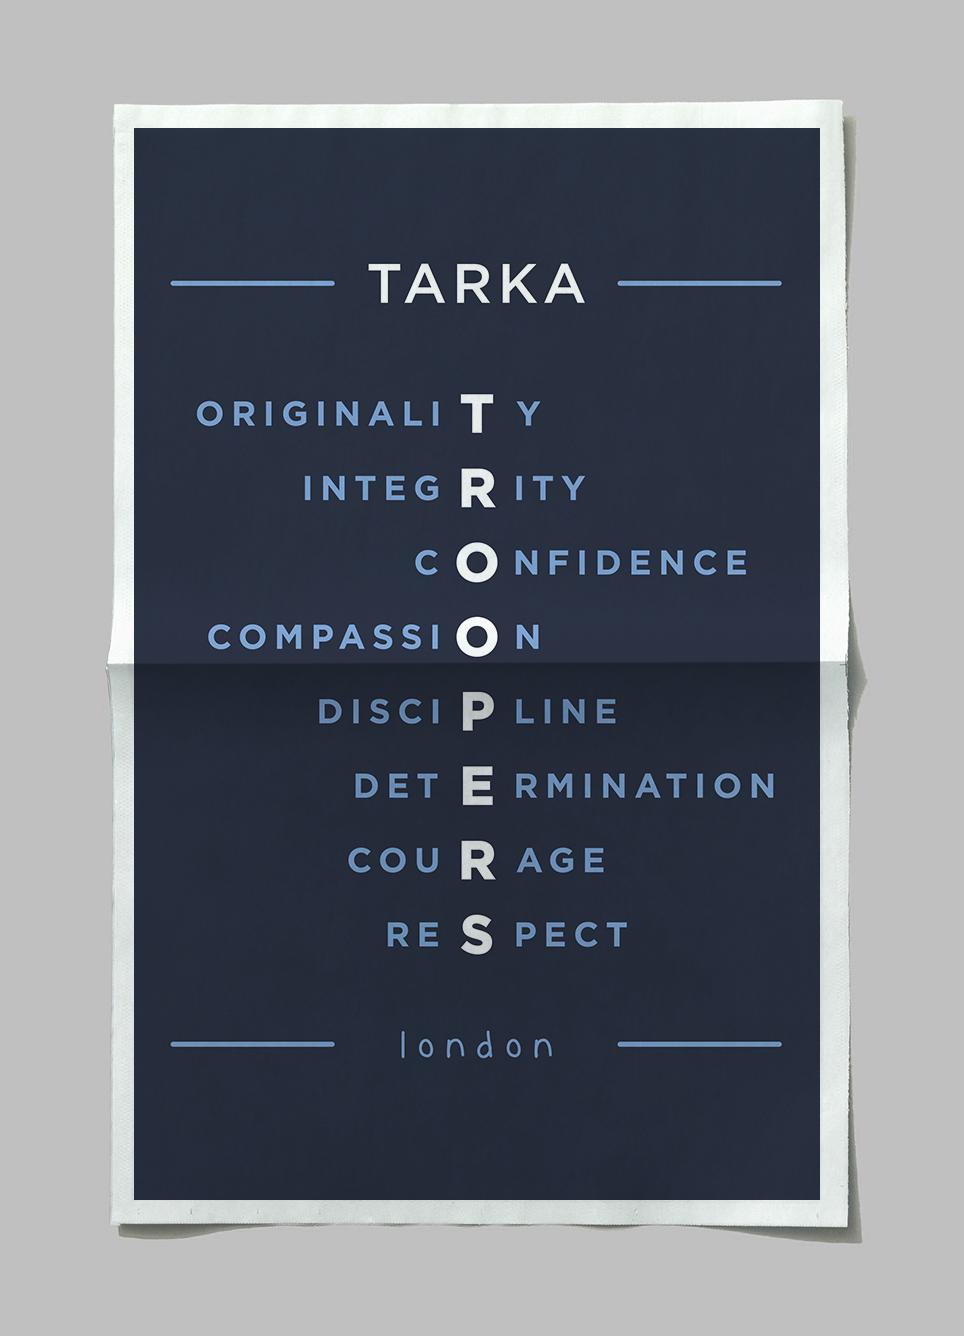 https://www.tarkalondon.com/about-tarka